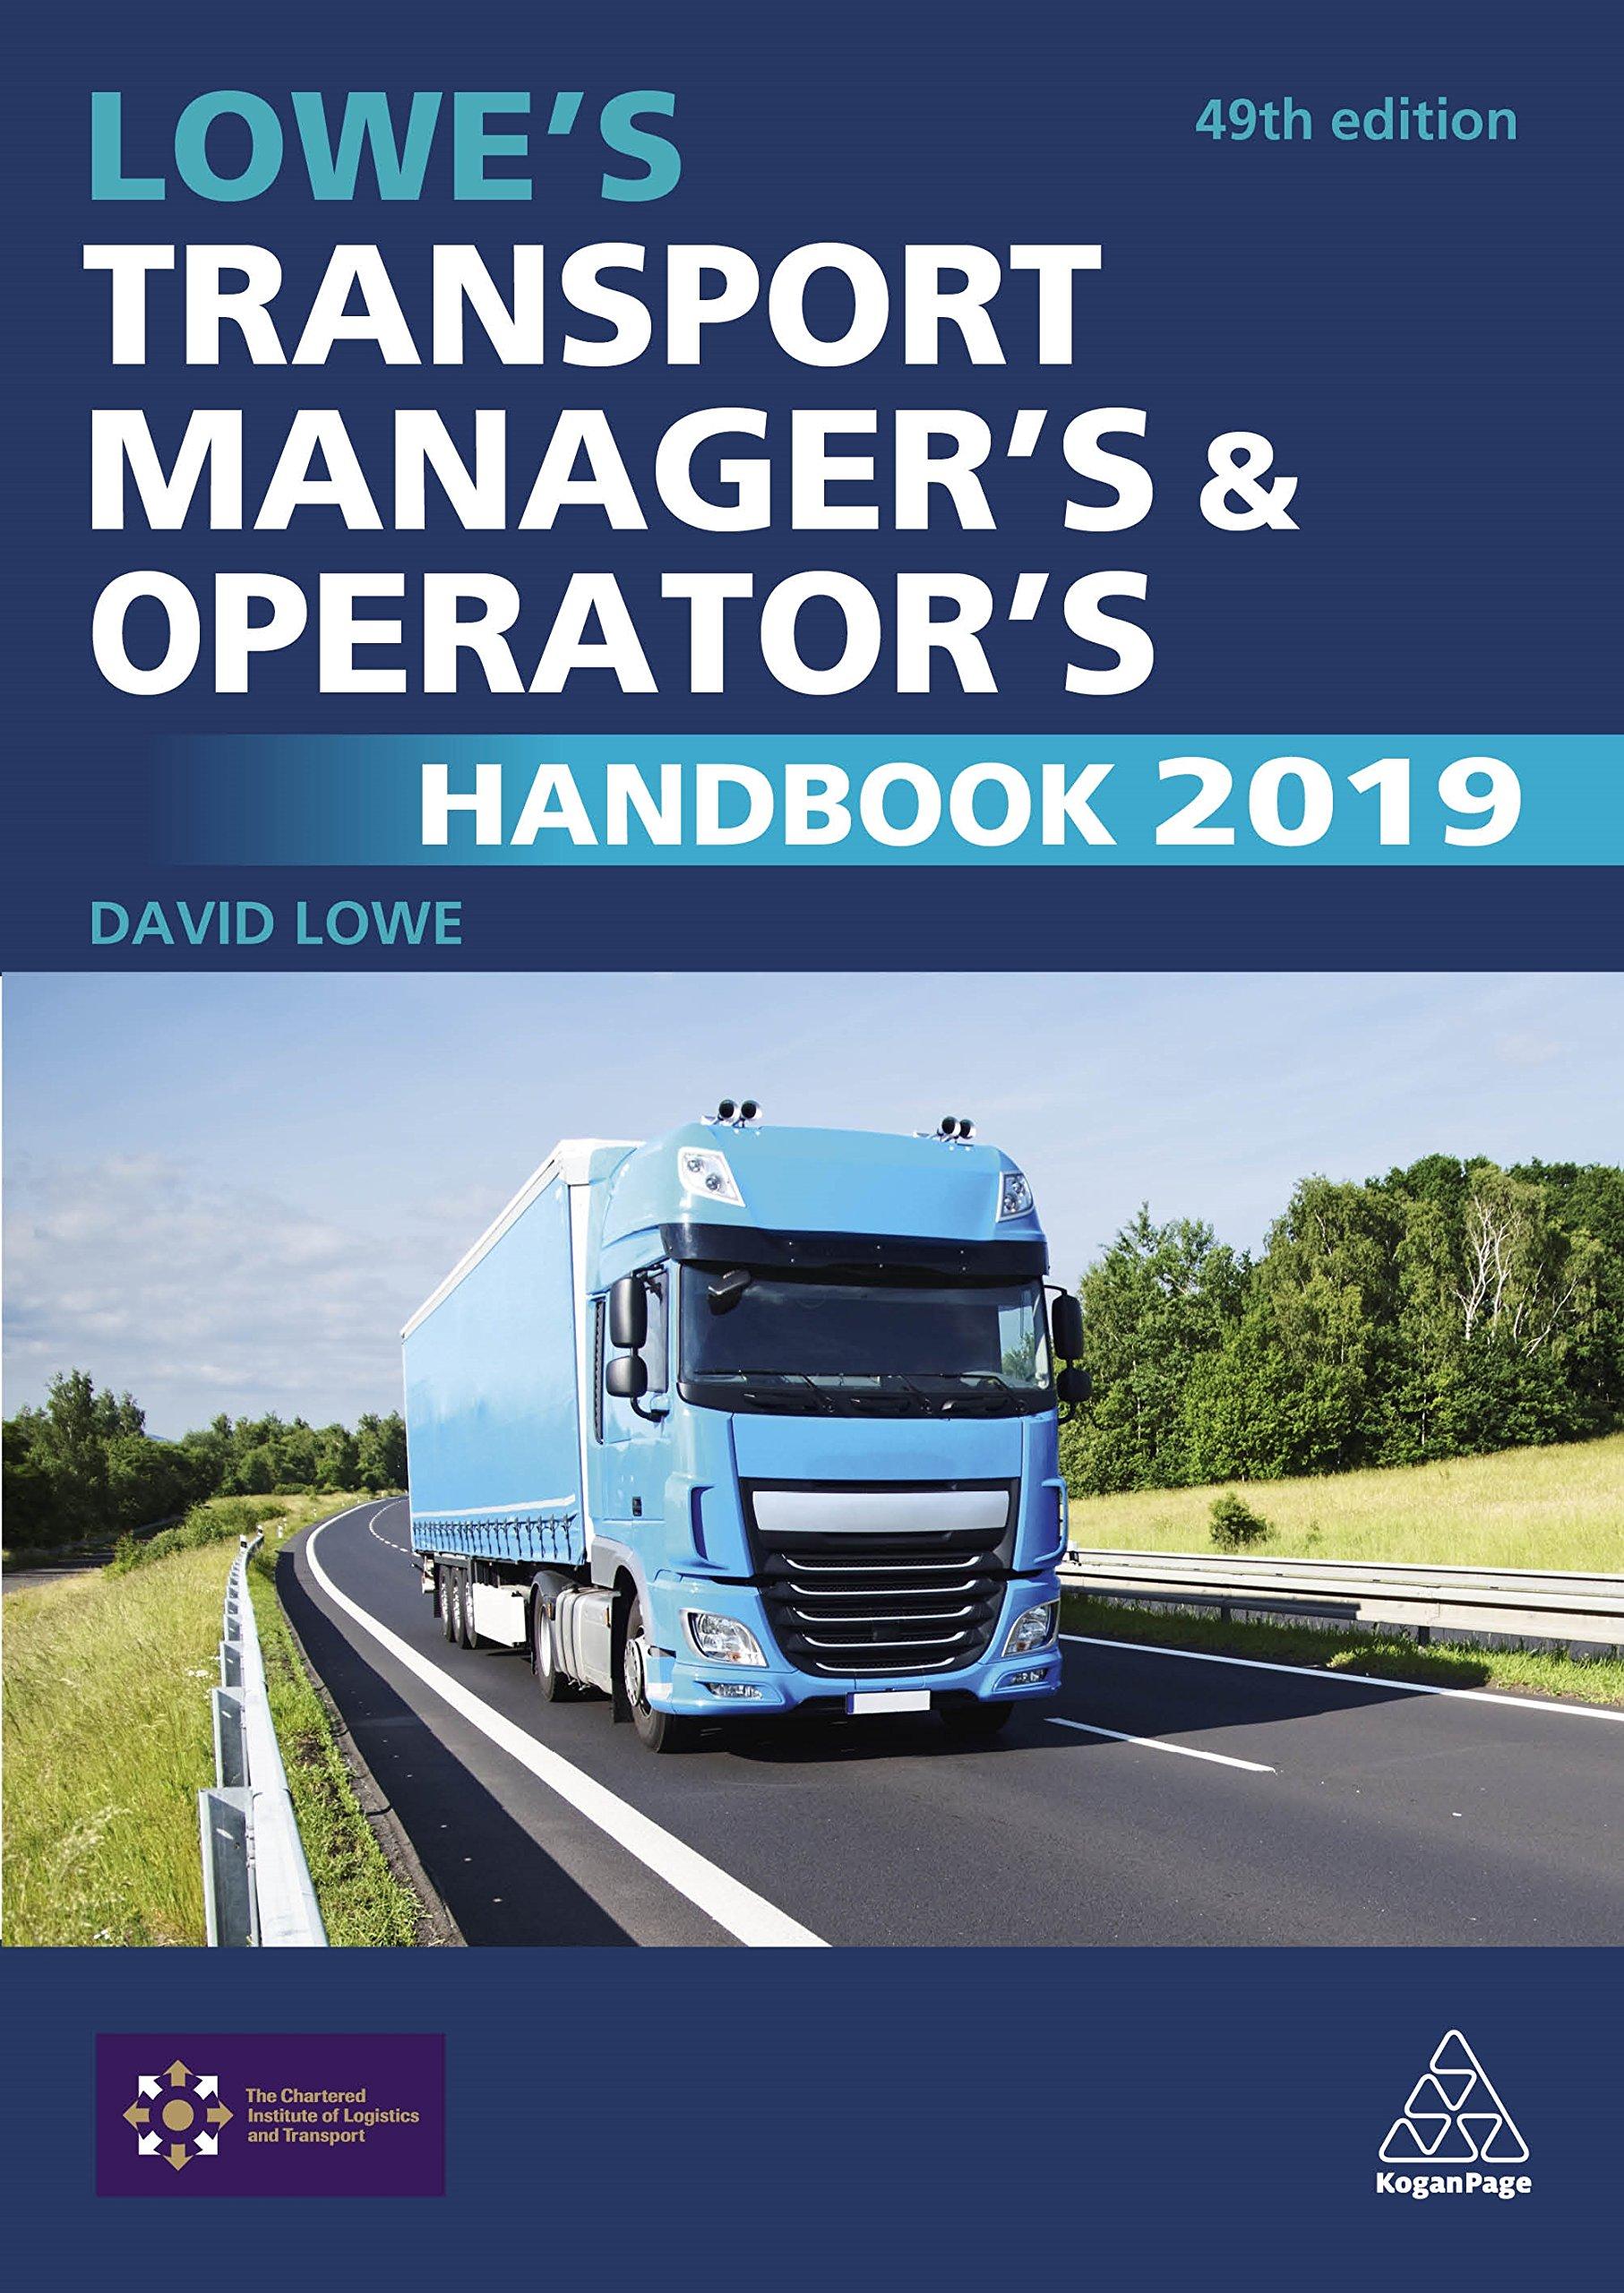 Lowe's Transport Manager's & Operators Handbook 2016